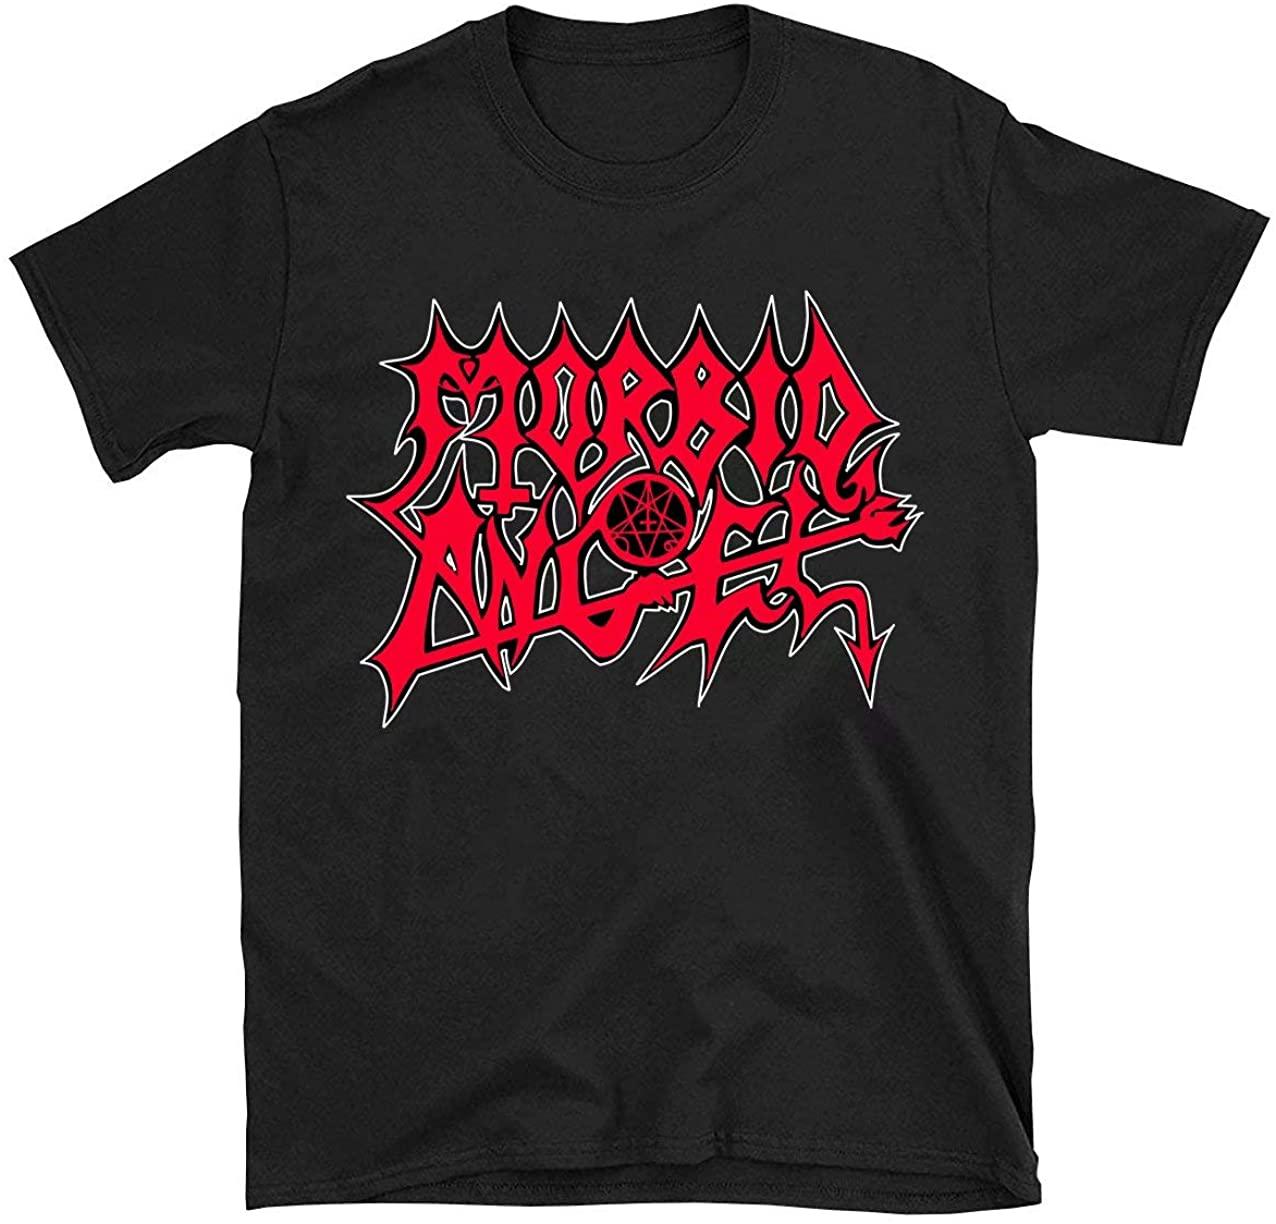 Moc.Deamiarr Men's Morbid Angel t Shirt Classic Logo Graphic Printing Shirts Top Black